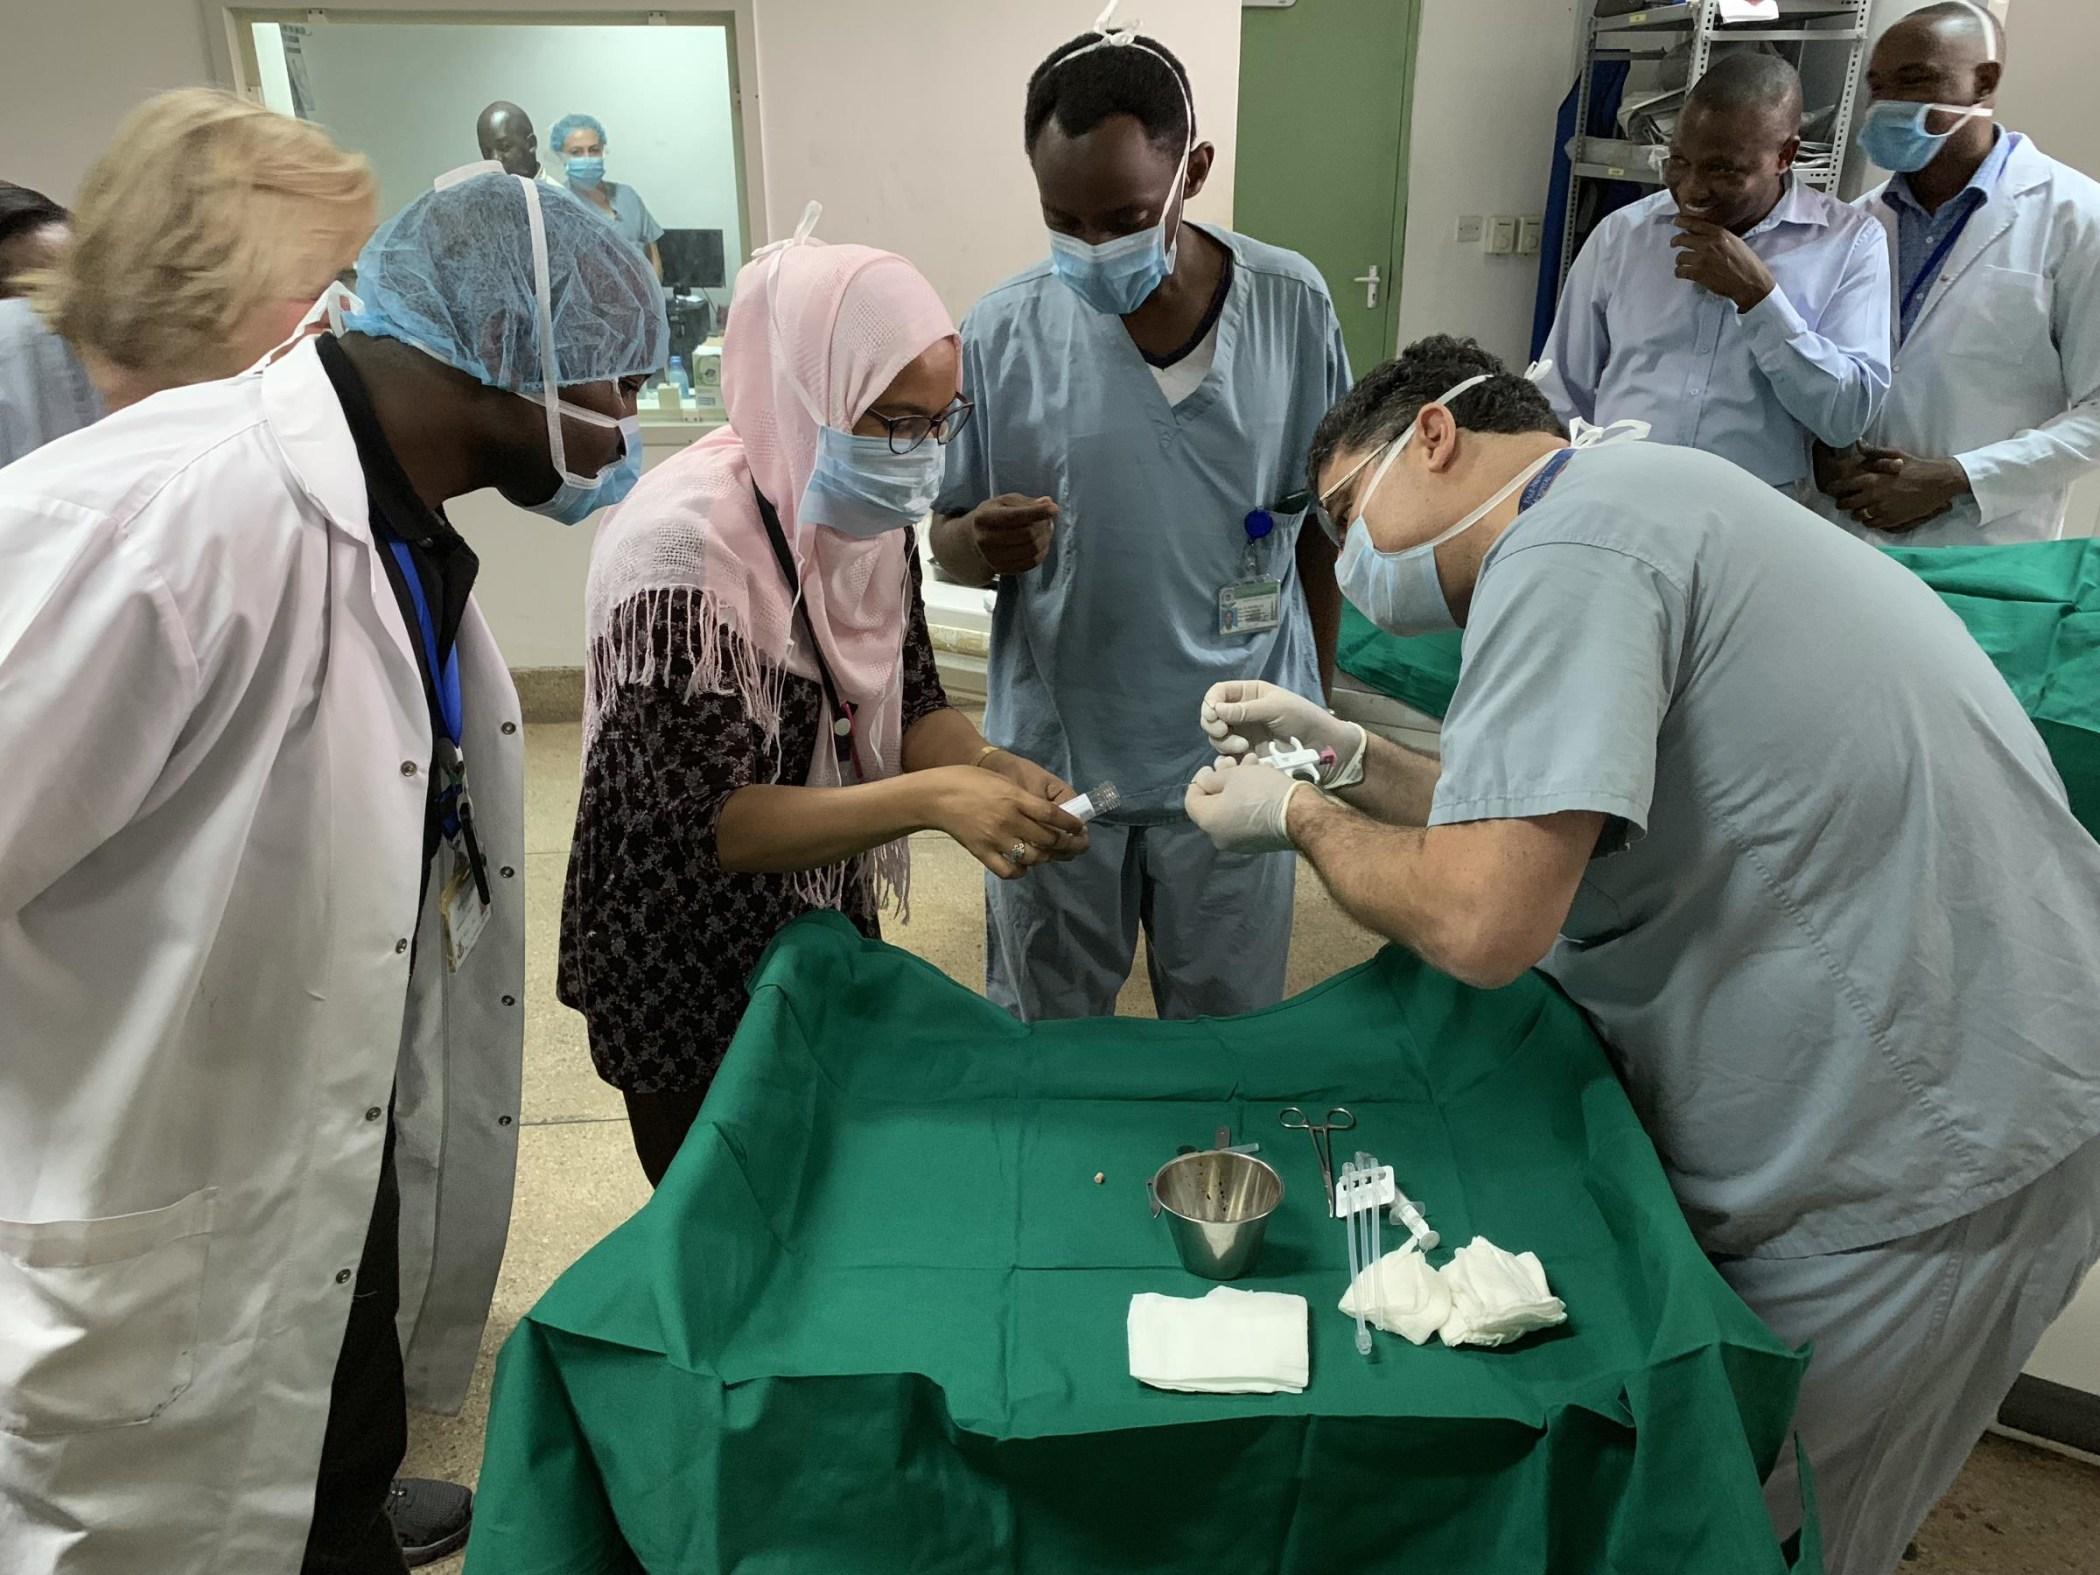 Drs. Douglas Silin and Azza Naif securing a core needle biopsy specimen.